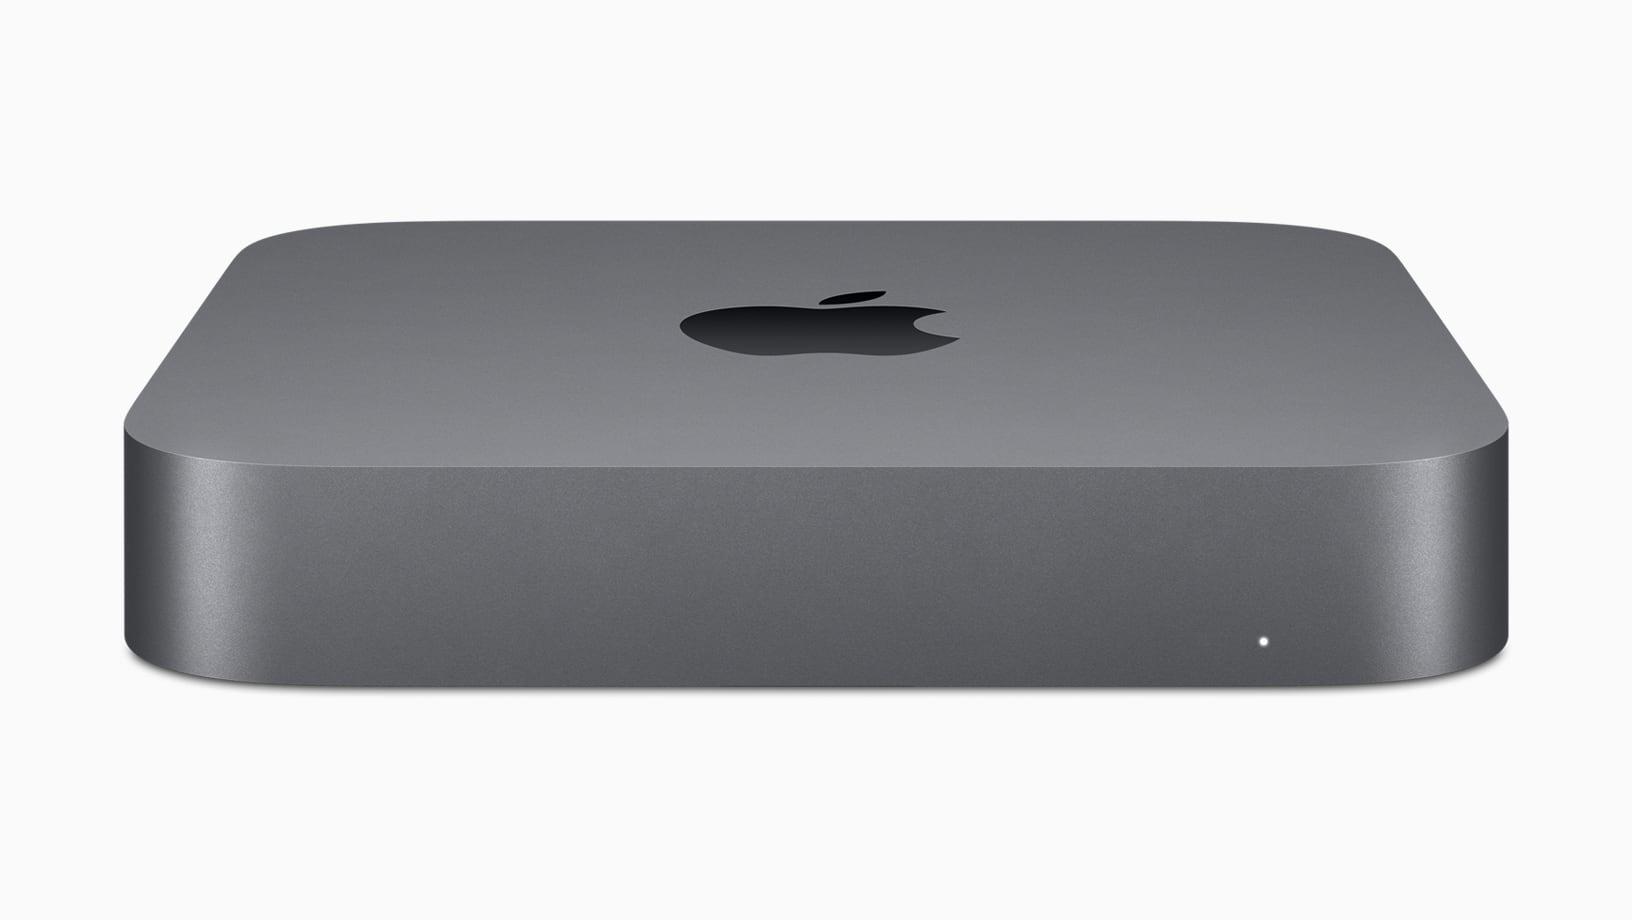 2018 space grey Mac mini